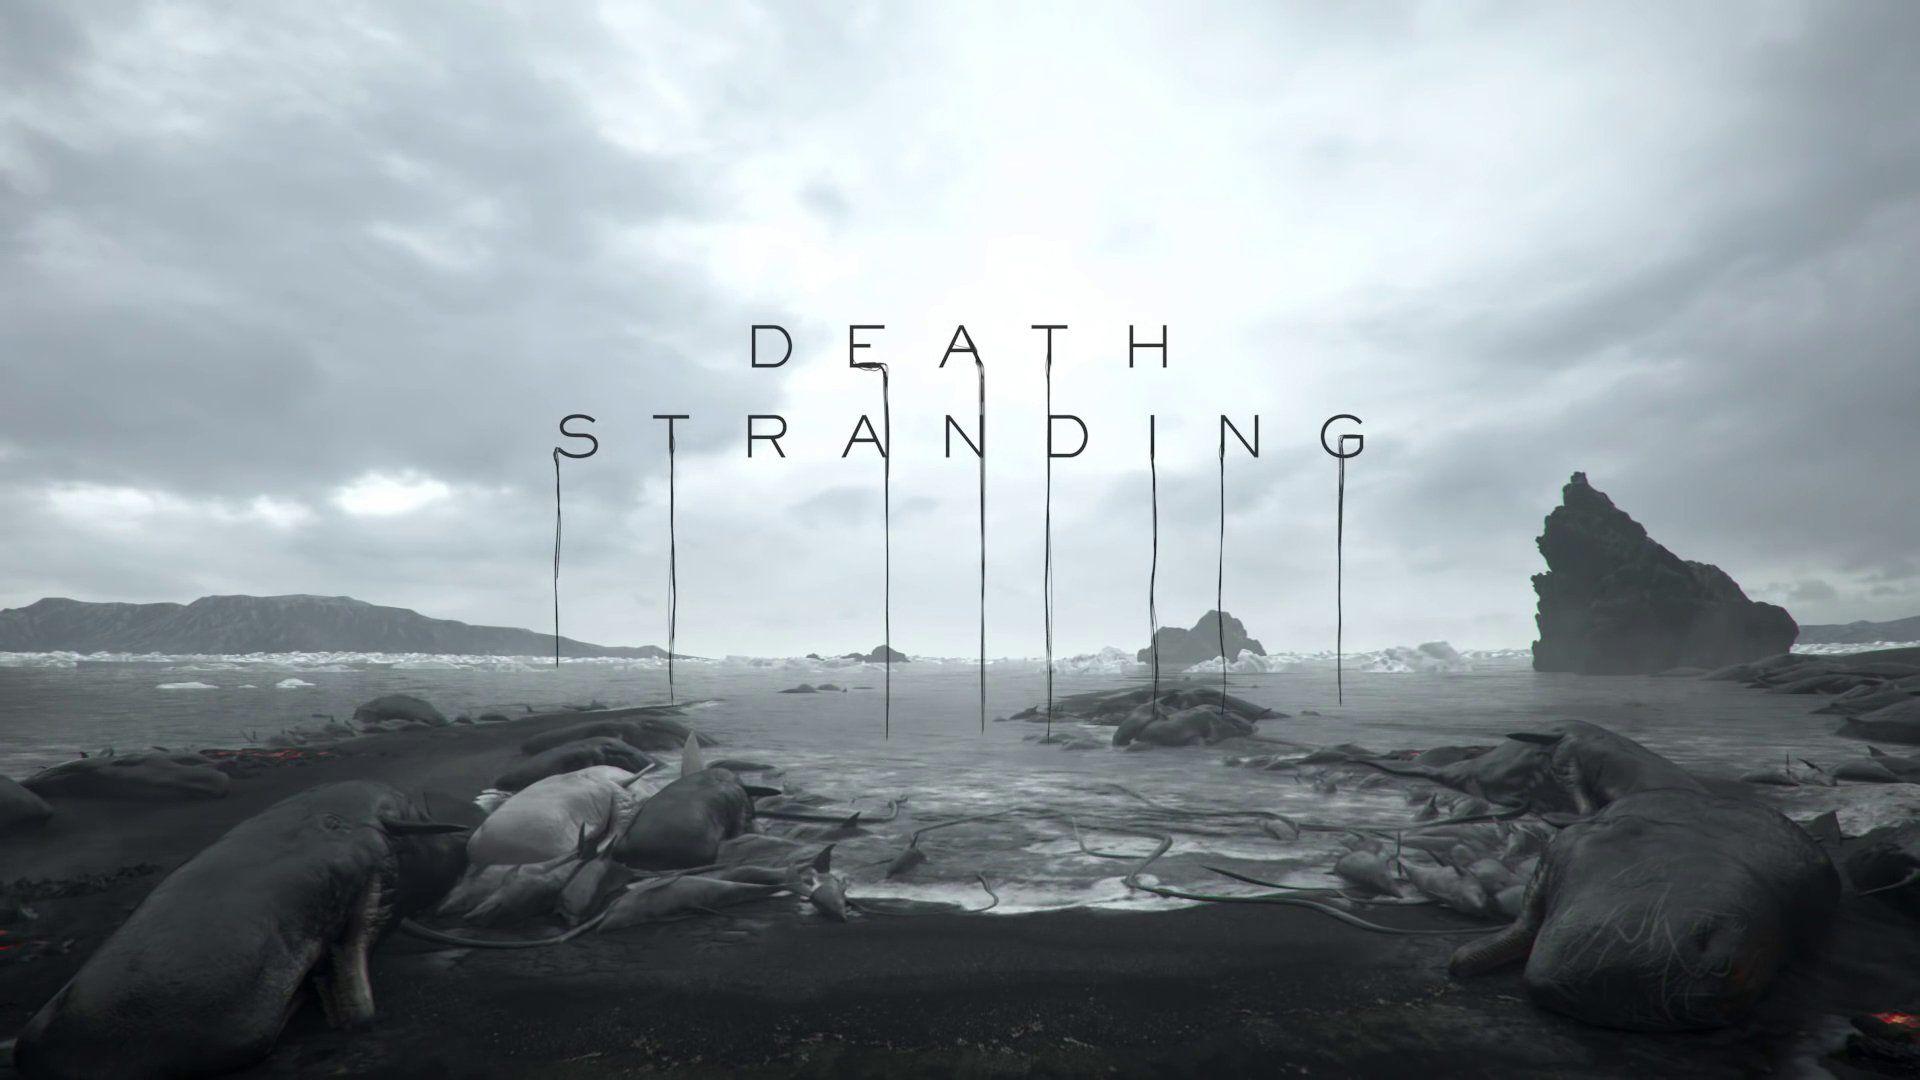 Death Stranding,کوجیما,نام اولیه بازی Death Stranding